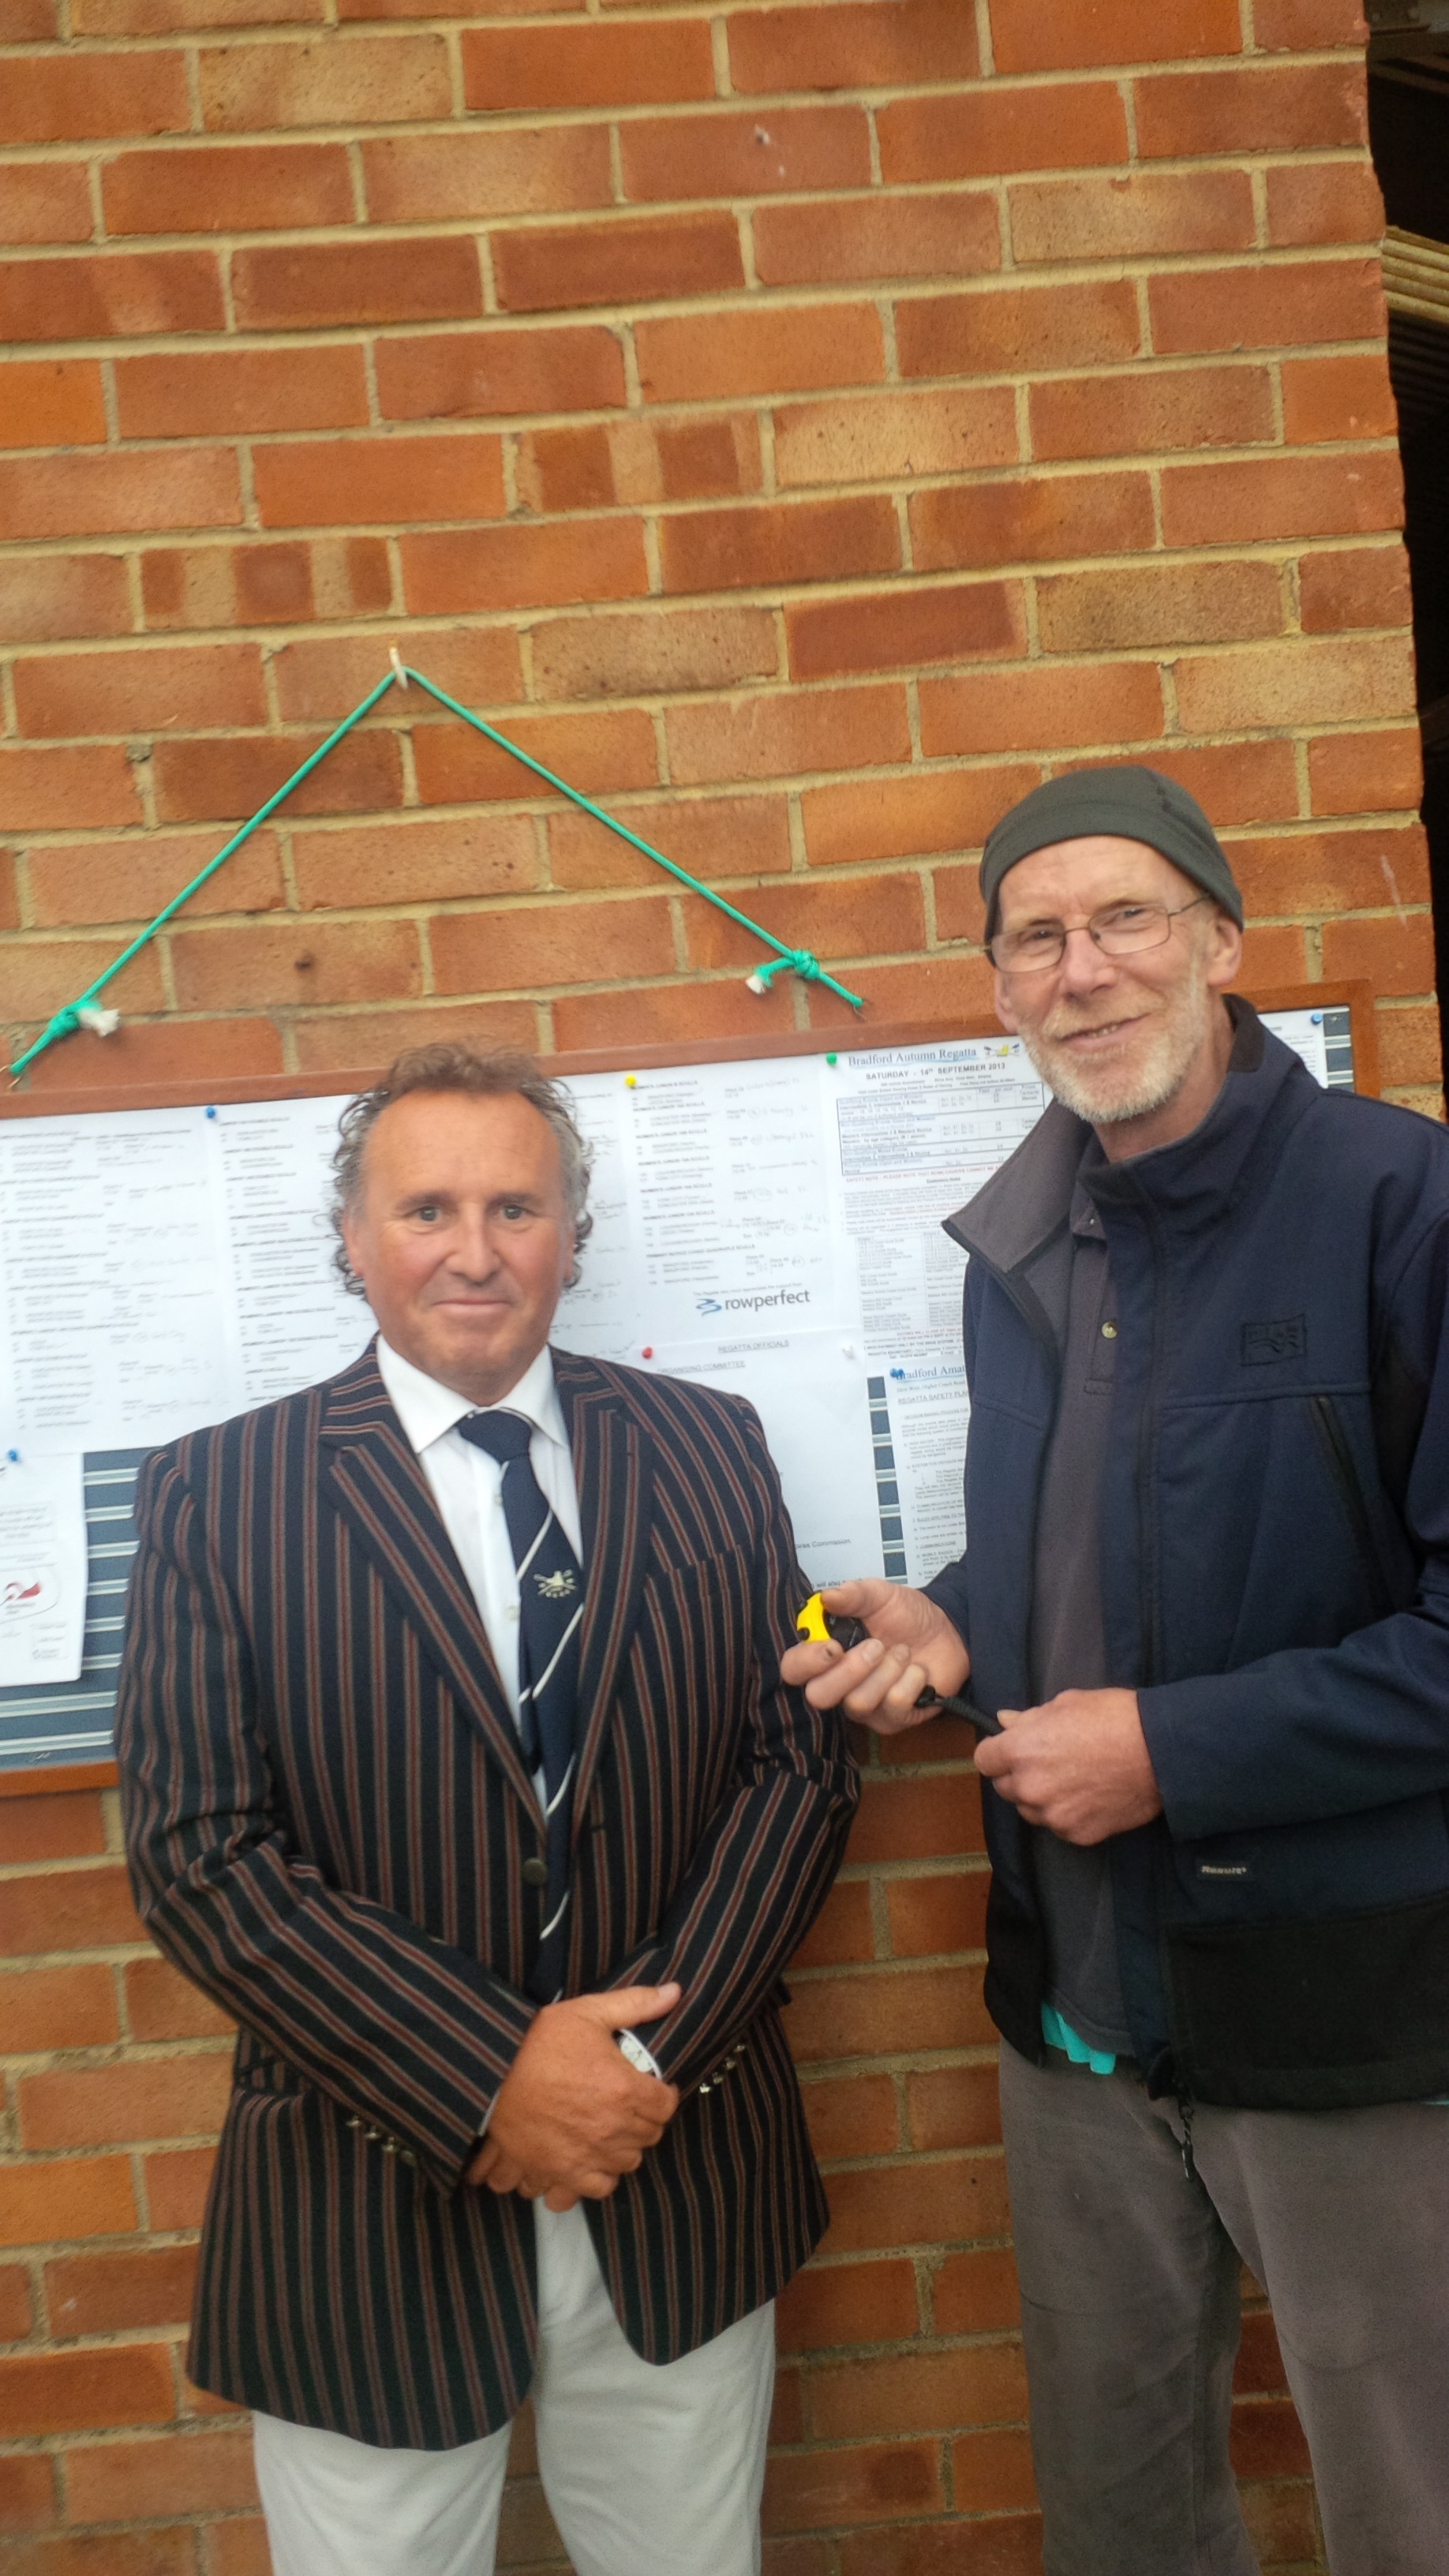 Hugh Scott (winning Coach) Bradford Amateur RC receives OarRATER rating watch sponsored by Rowperfect